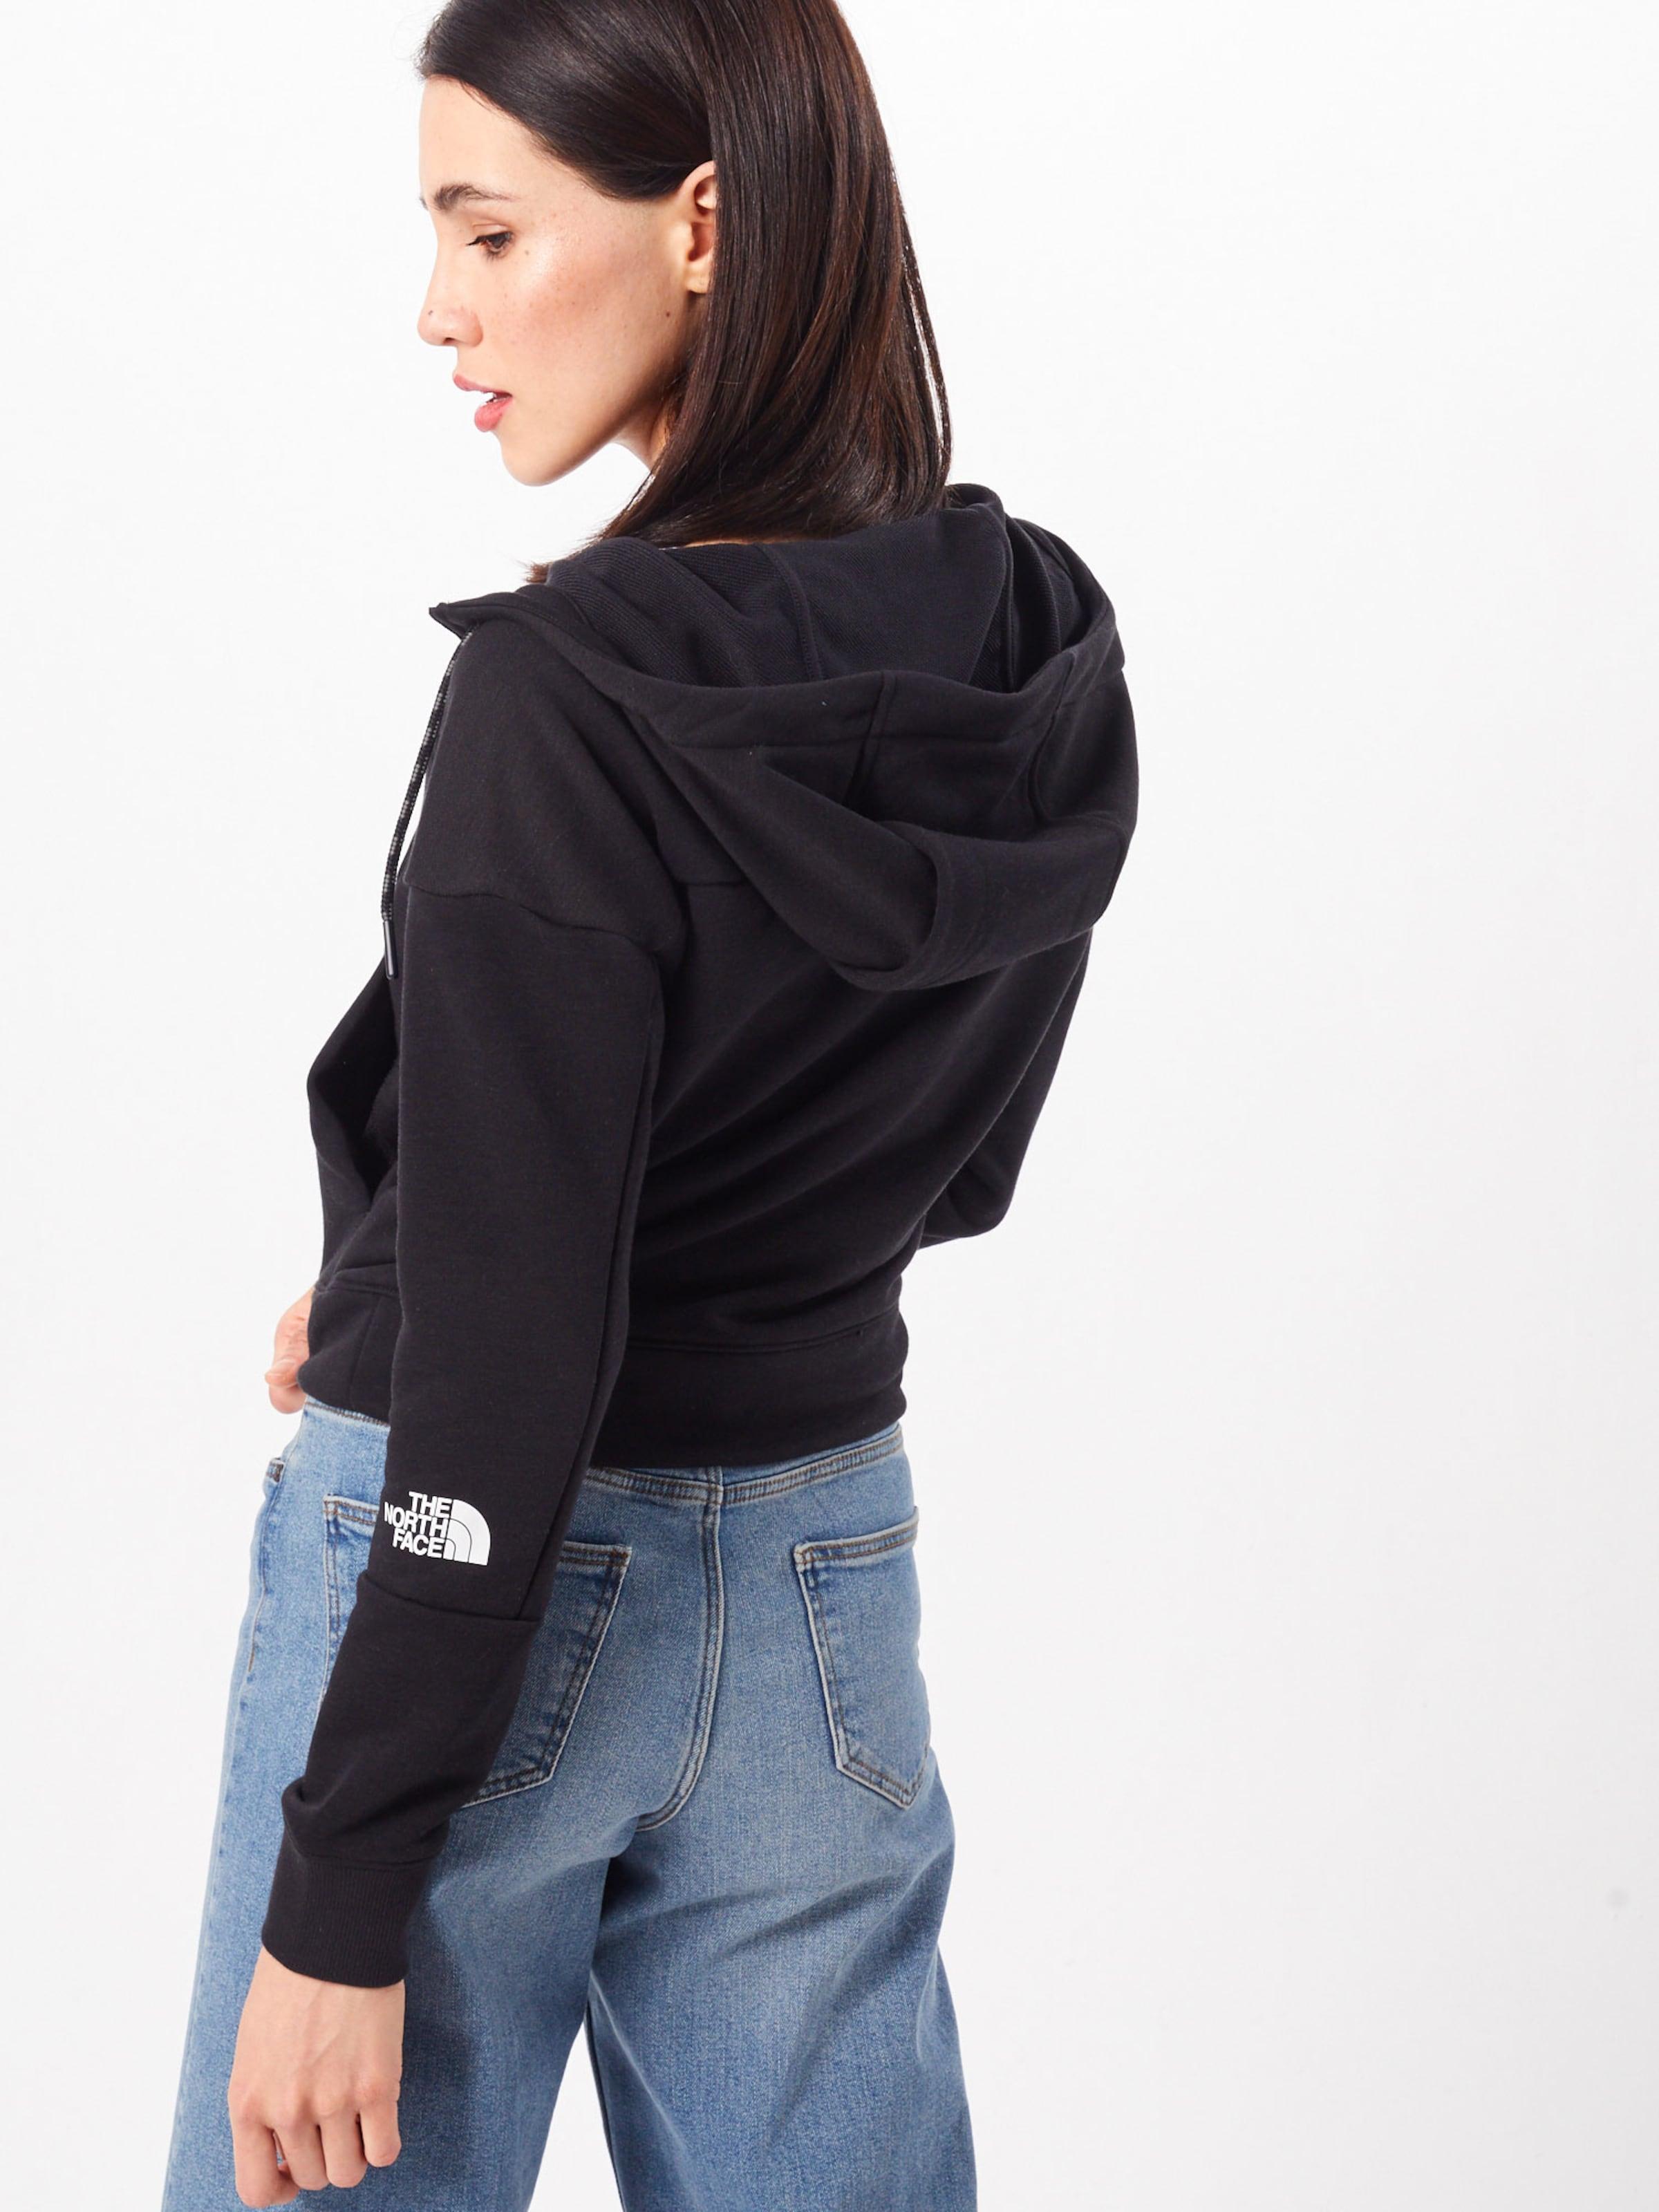 Hood' The Schwarz Fullzip Fleece North Light Face Sweatjacke 'women's In JFlK1c